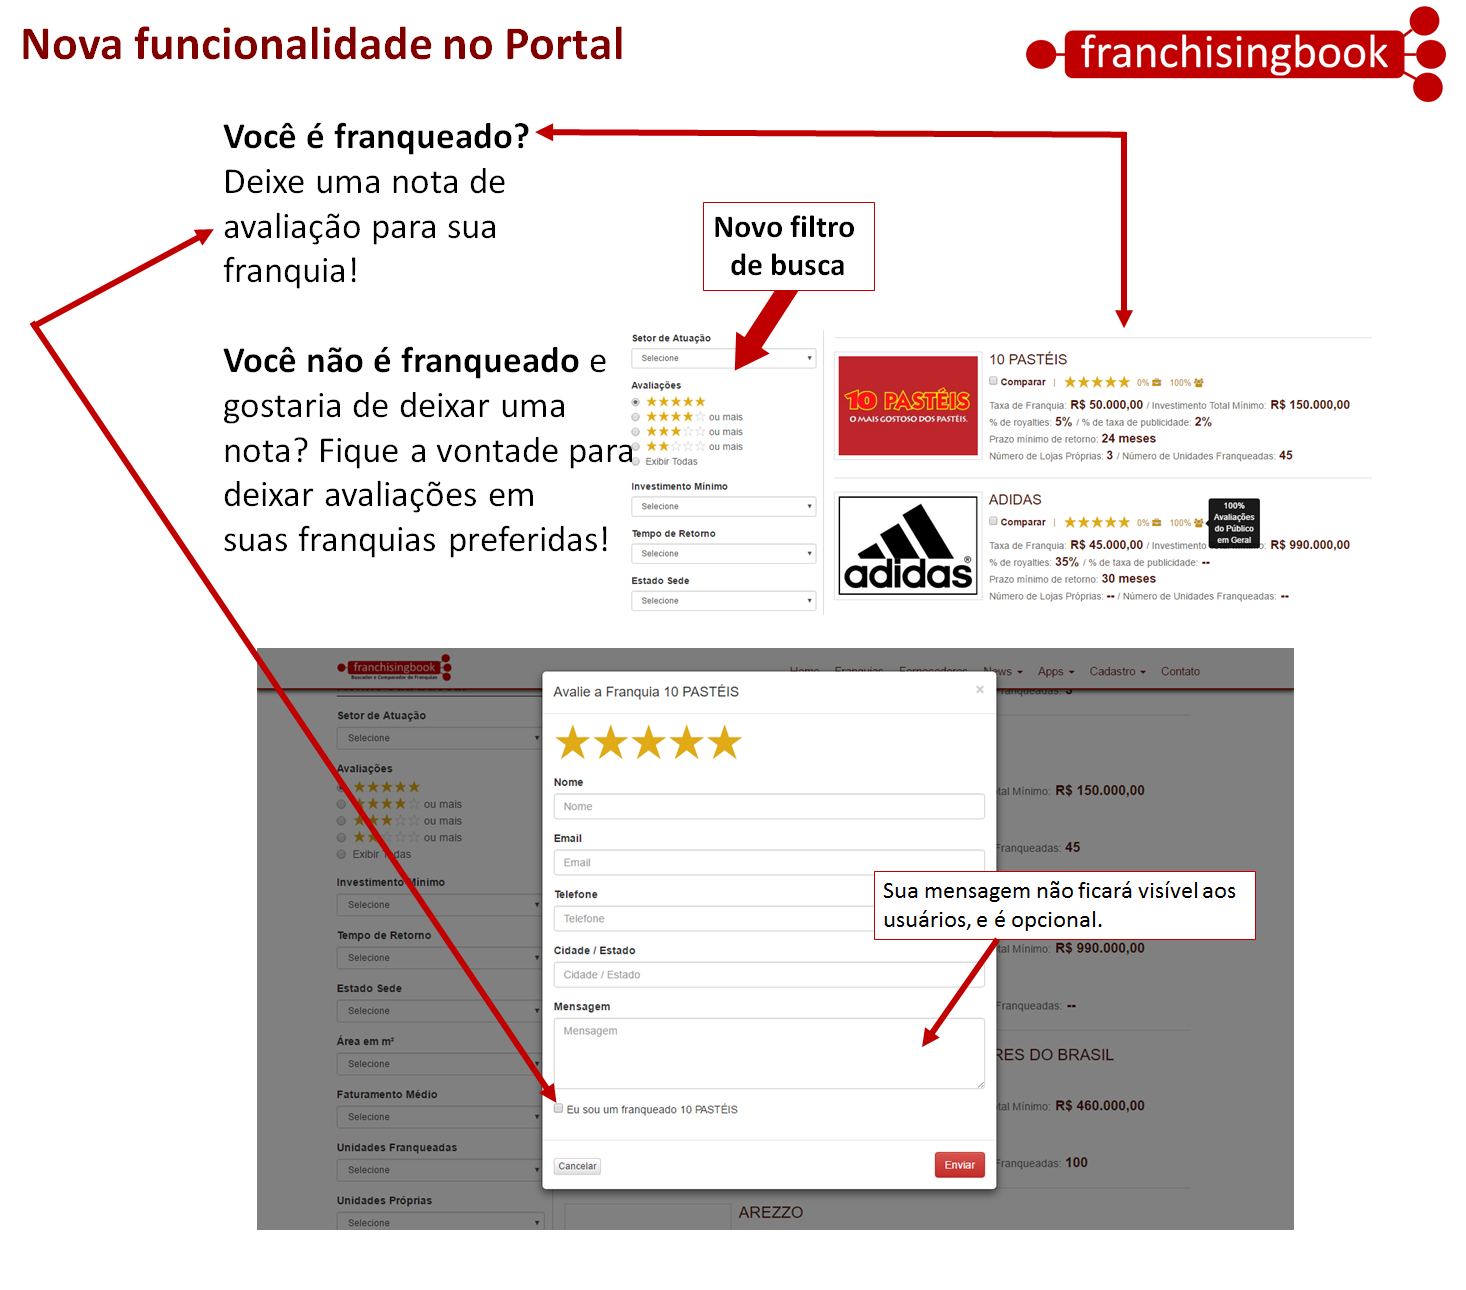 nova-funcionalidade-franchisingbook